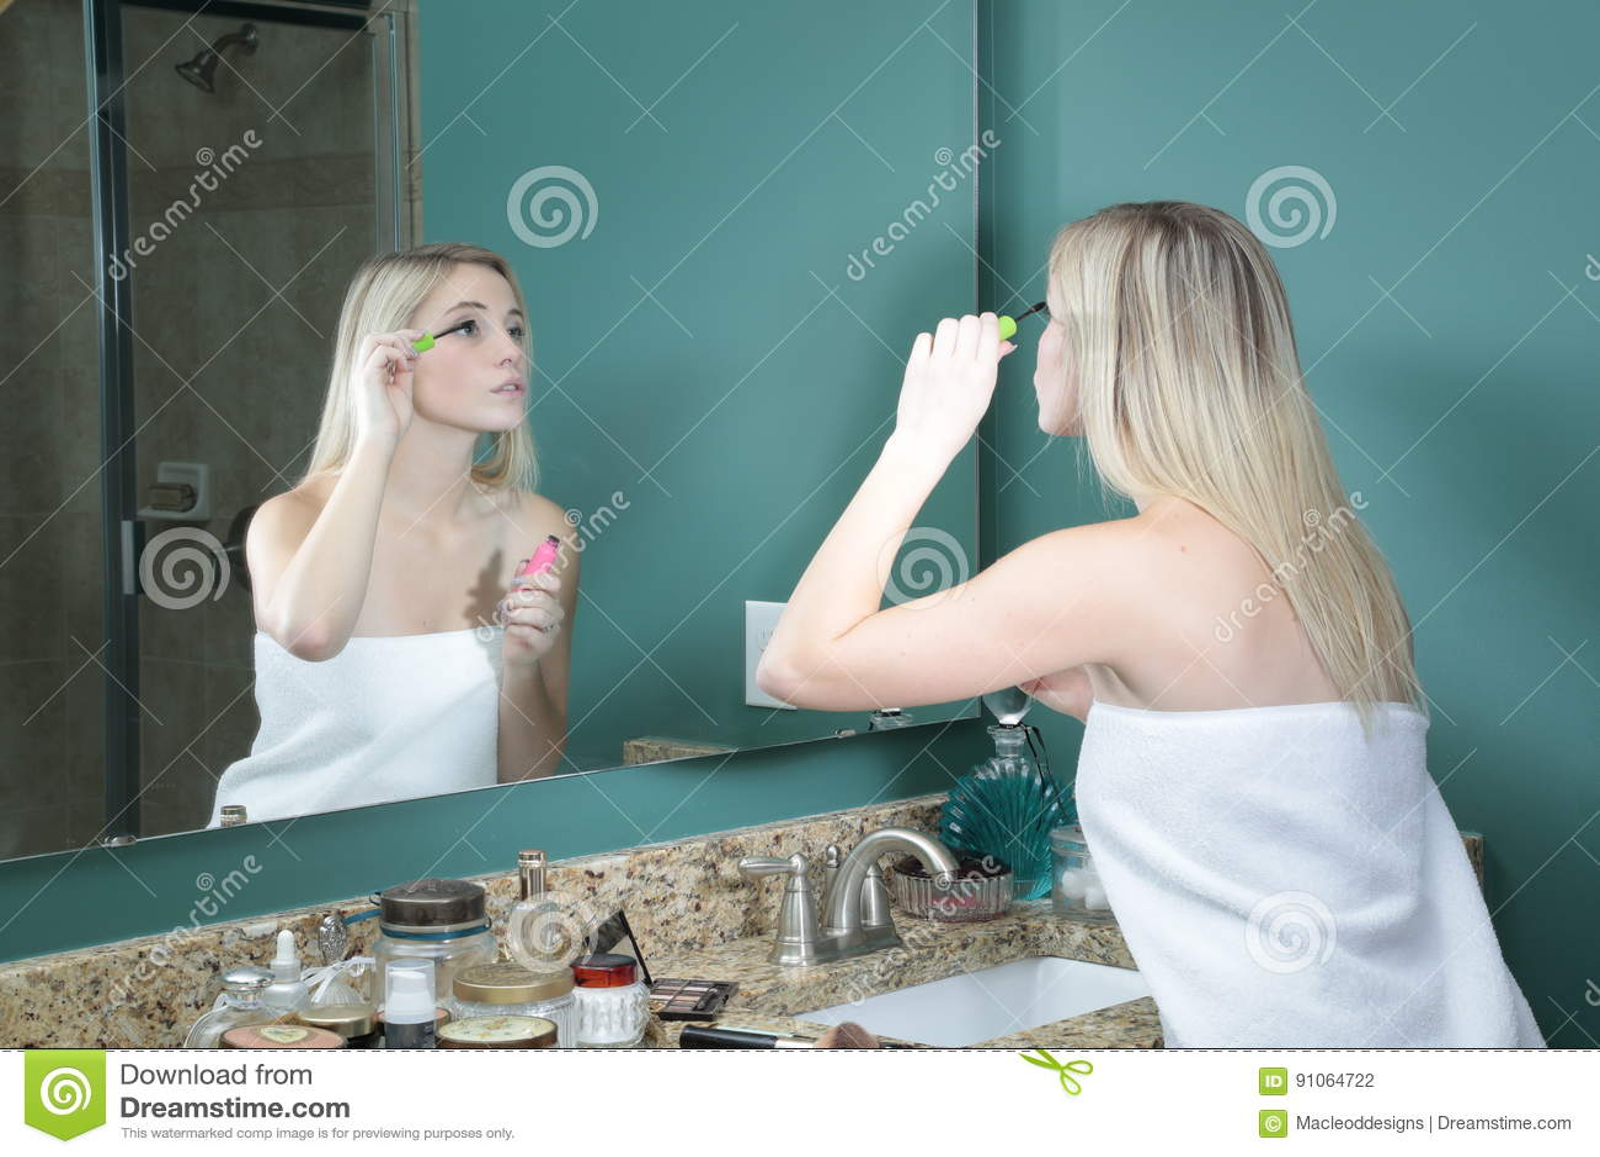 Think, teen girl bathroom mirror phrase